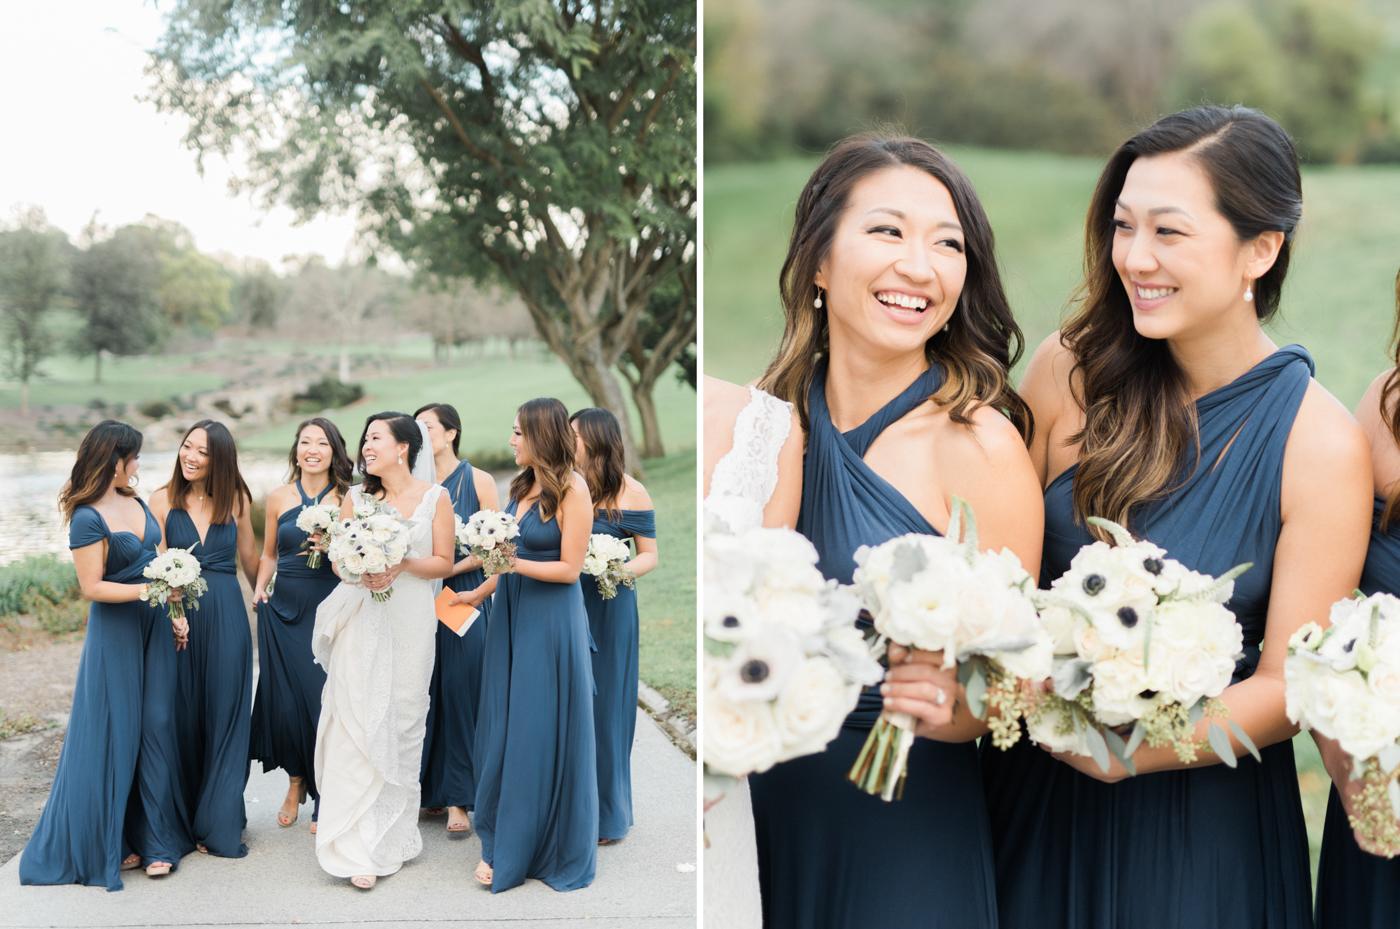 Friendly_Hills_Country_Club_fine_art_wedding_photographer_los_angeles_paris-19.jpg